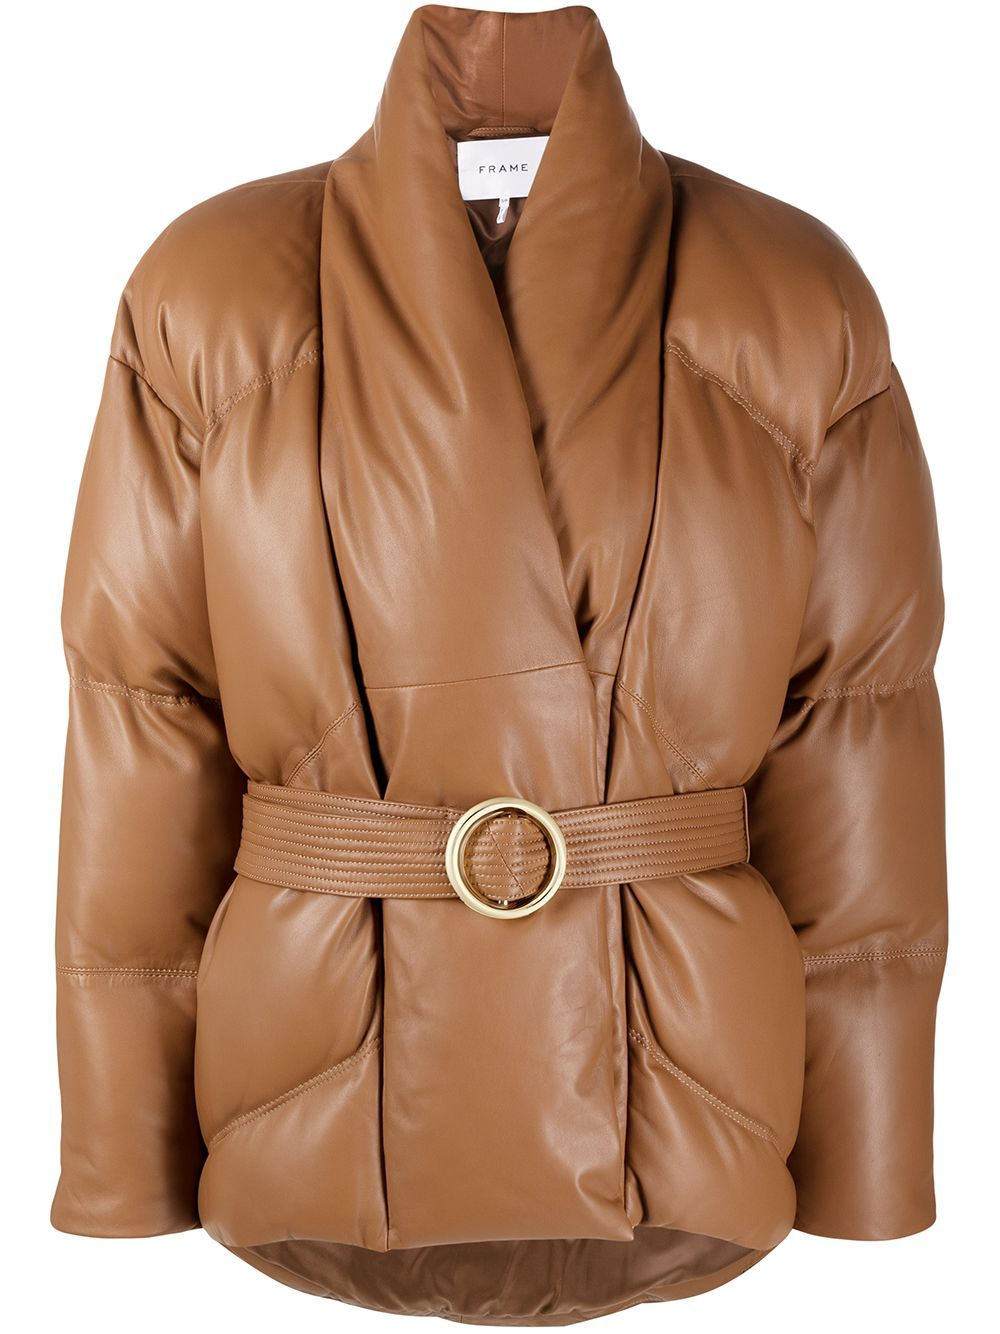 Frame Wrap Leather Puffer Jacket Farfetch In 2021 Leather Puffer Jacket Jackets Puffer Jackets [ 1334 x 1000 Pixel ]